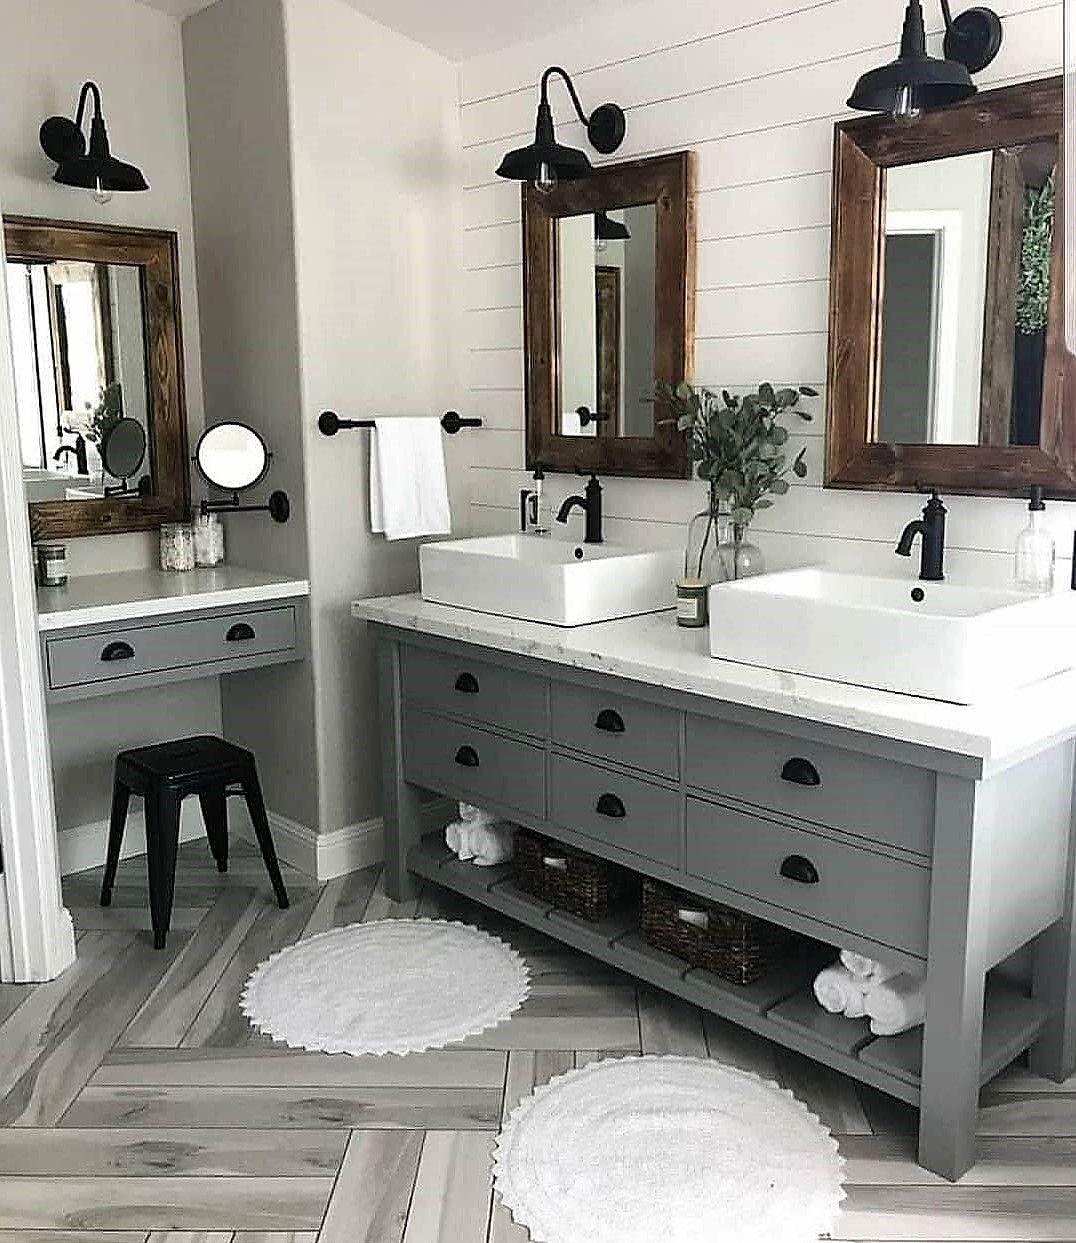 Modern Rustic Bathrooms And Decor Ideas Rustic Home Decor And Design Ideas Farmhouse Bathroom Mirrors Bathroom Mirror Design Bathrooms Remodel